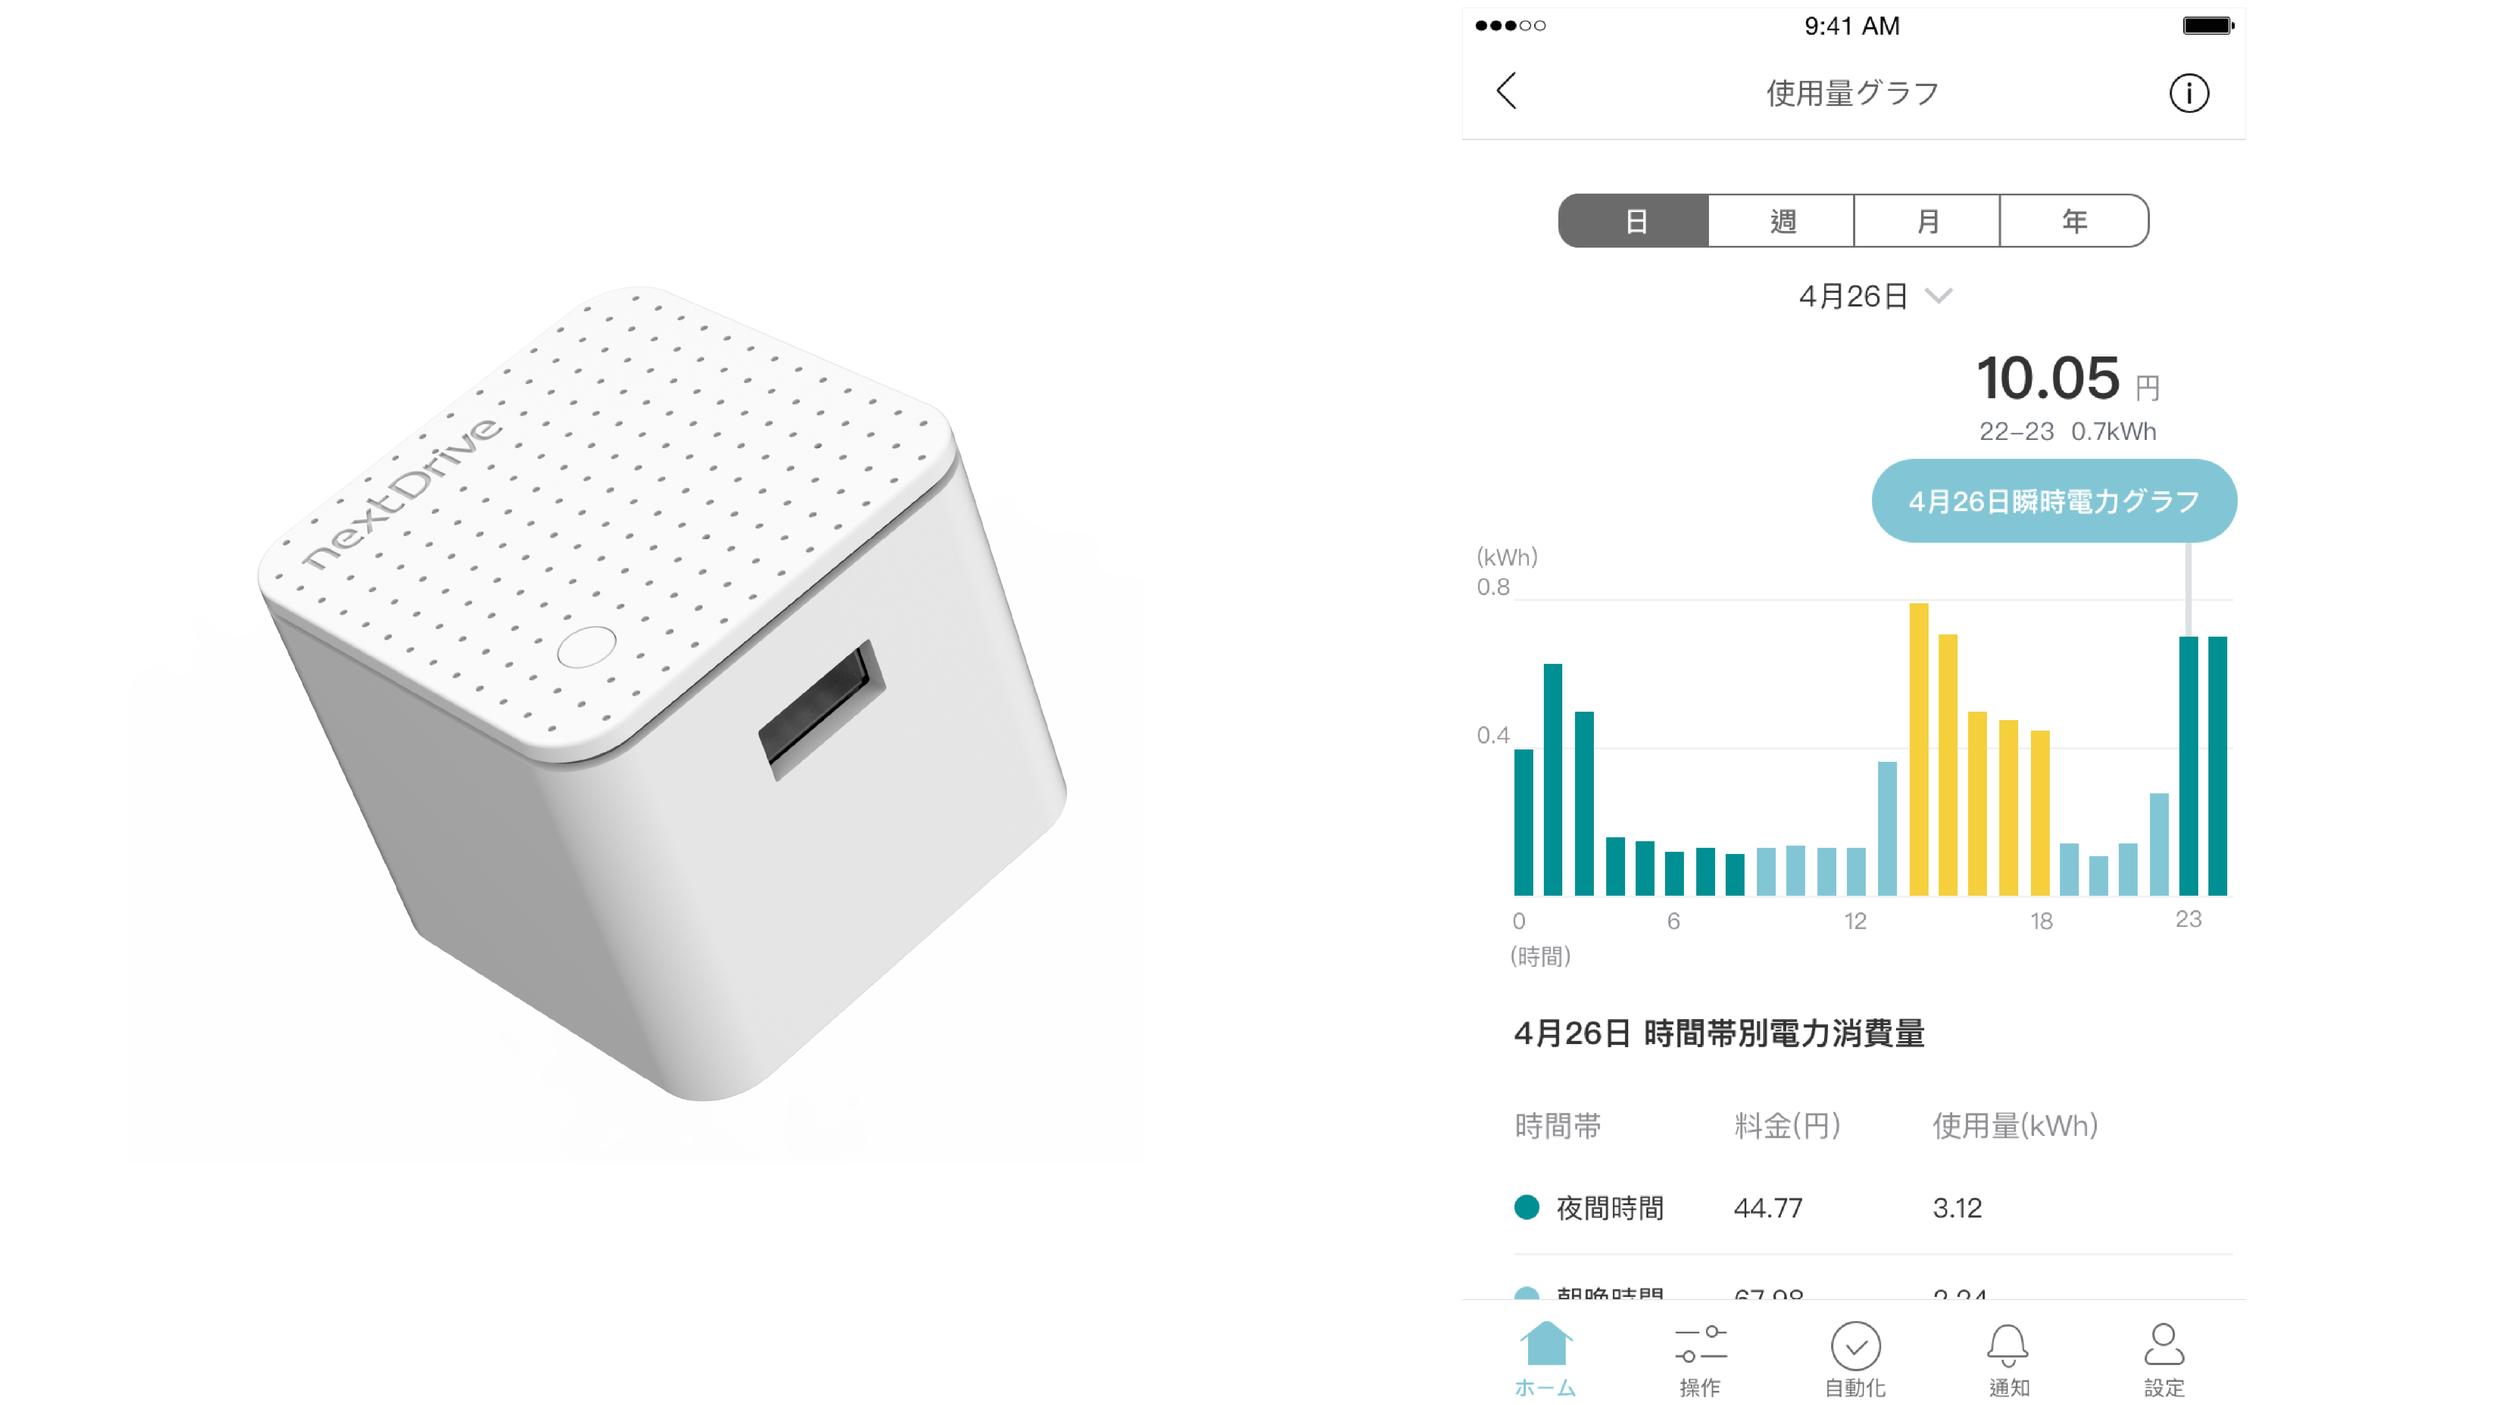 ▶ HEMS・IoTゲートウェイCube と 家庭エネルギー管理アプリEcogenie